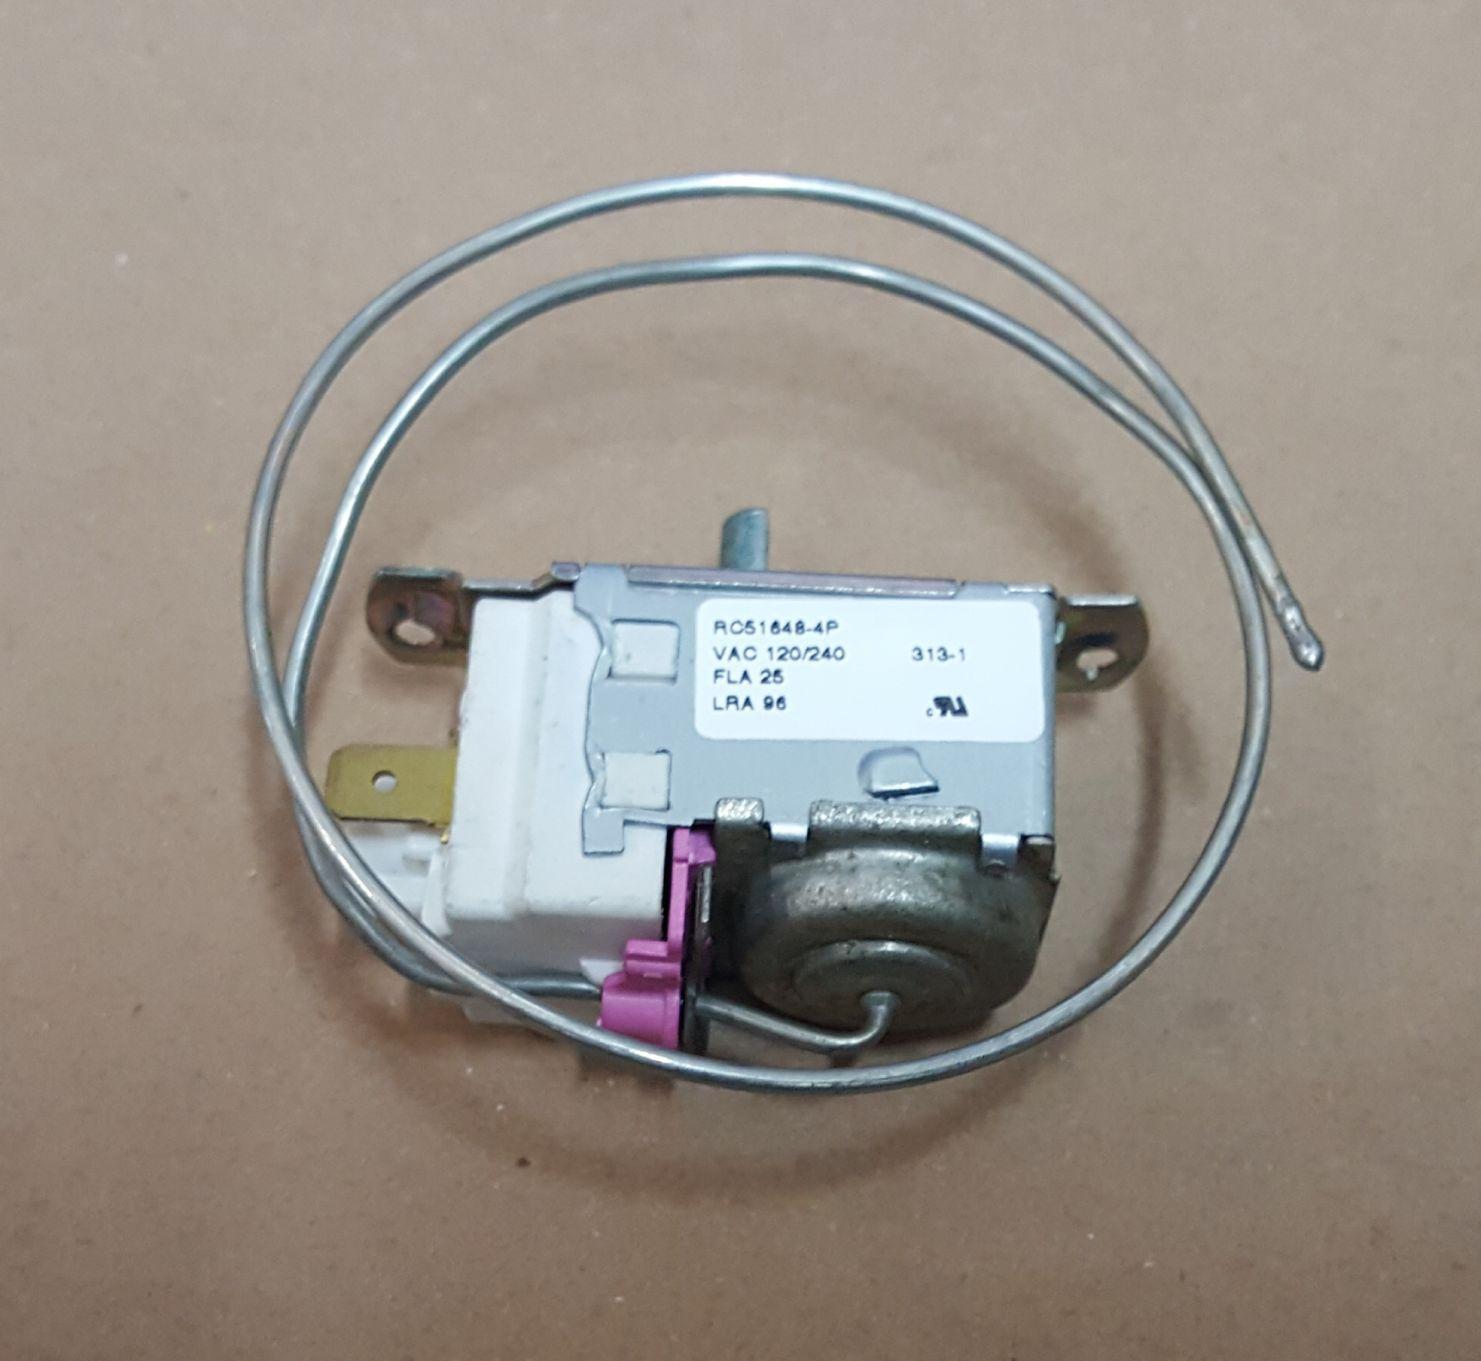 Termostato Vitrine Baixa Temperatura Metalfrio - RC51648-4P